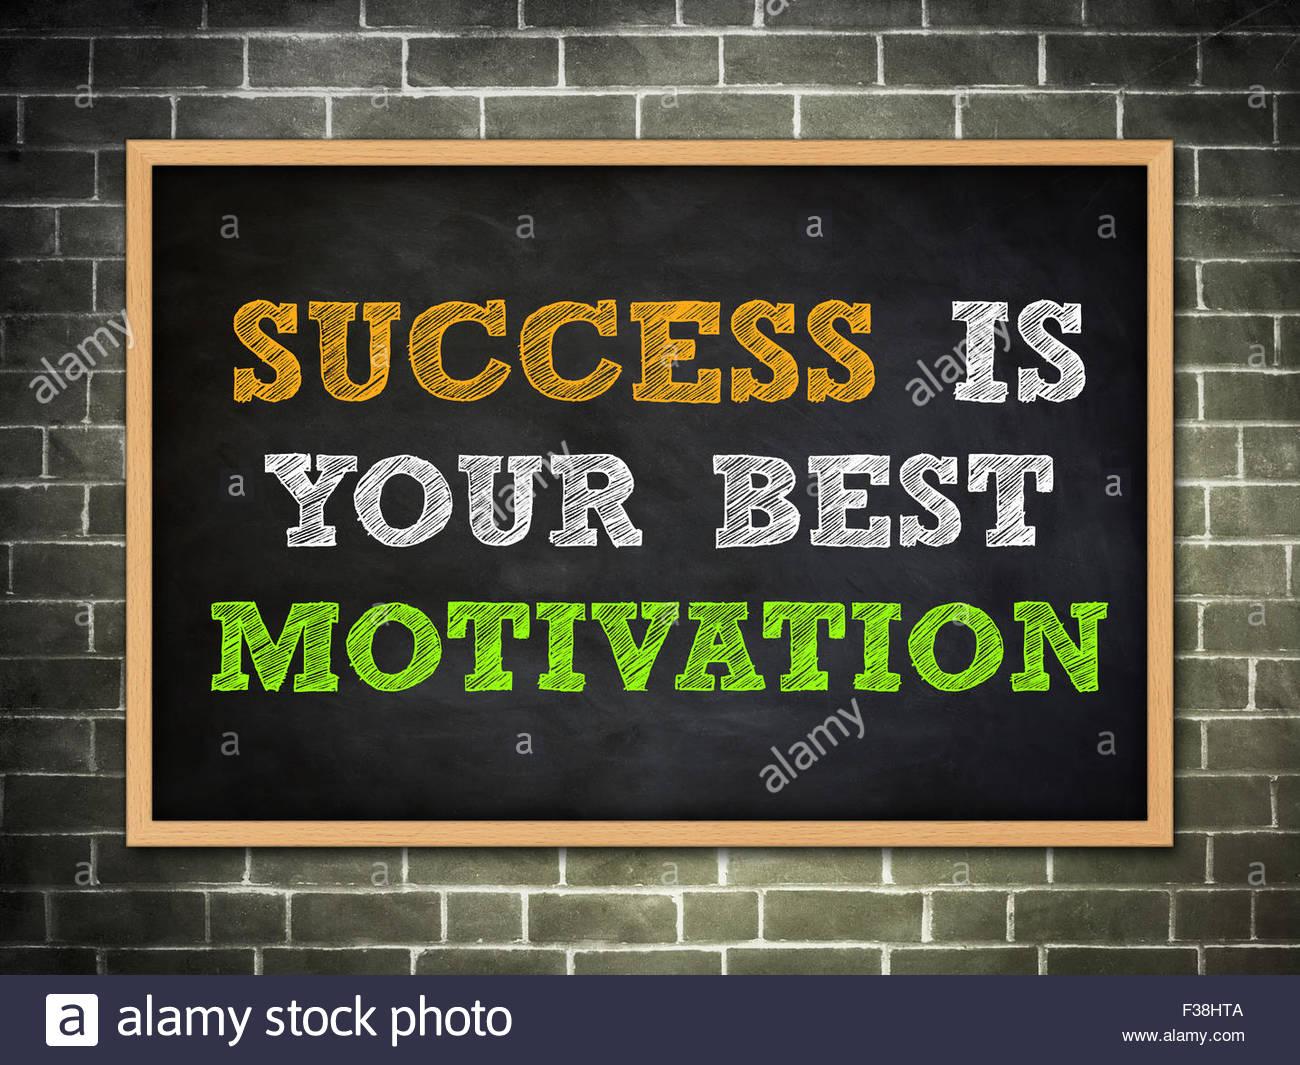 success is your best motivation - Stock Image